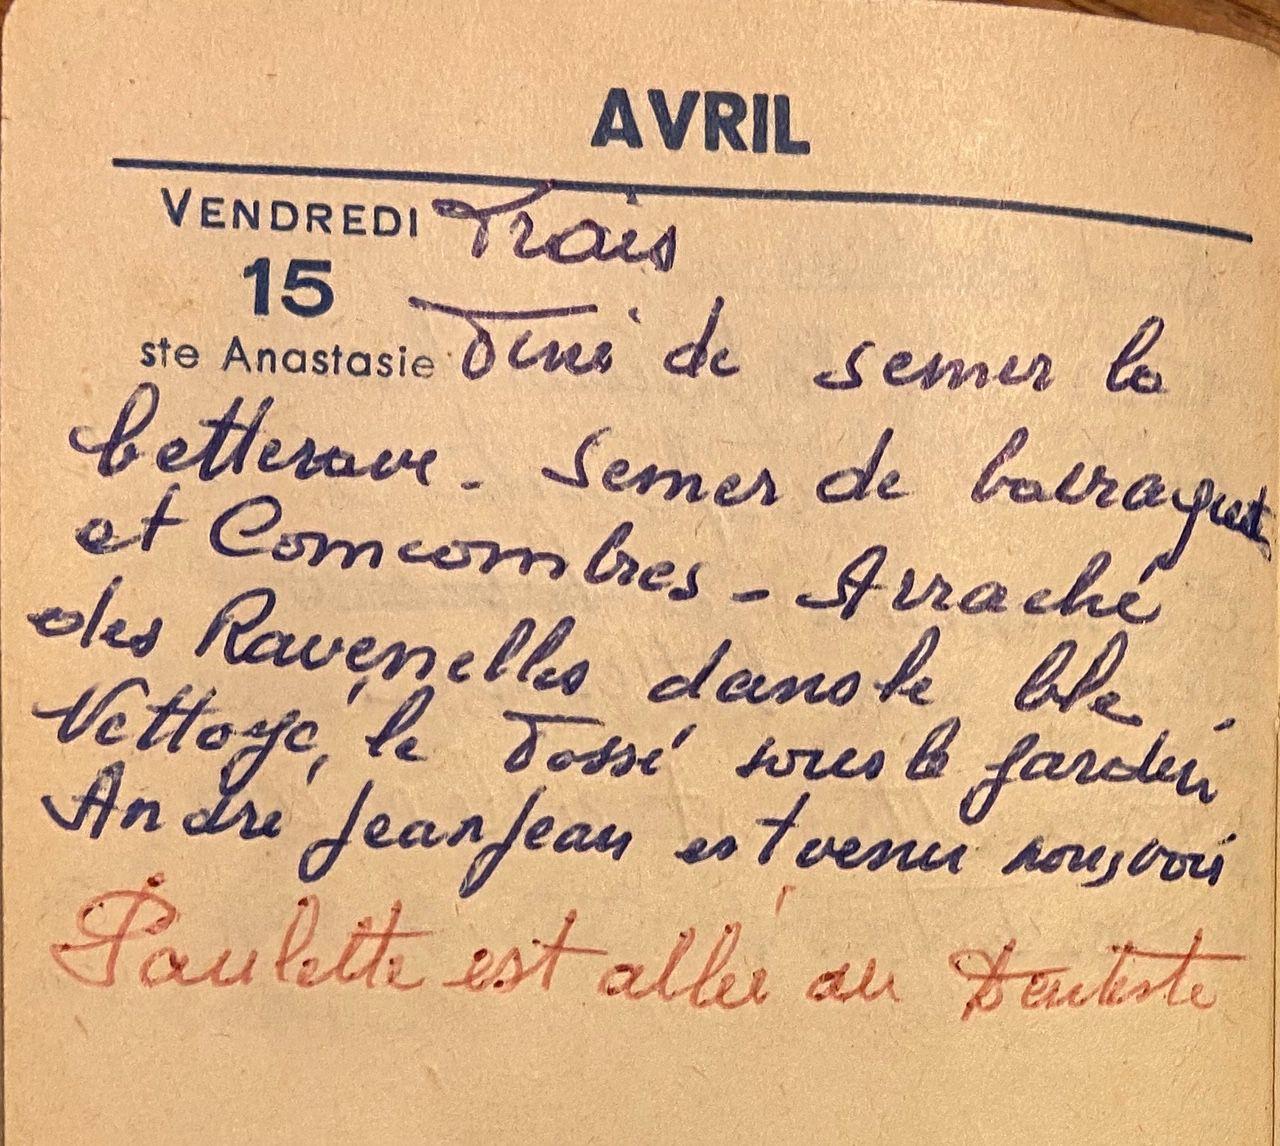 Vendredi 15 avril 1960 : semer les barraquets